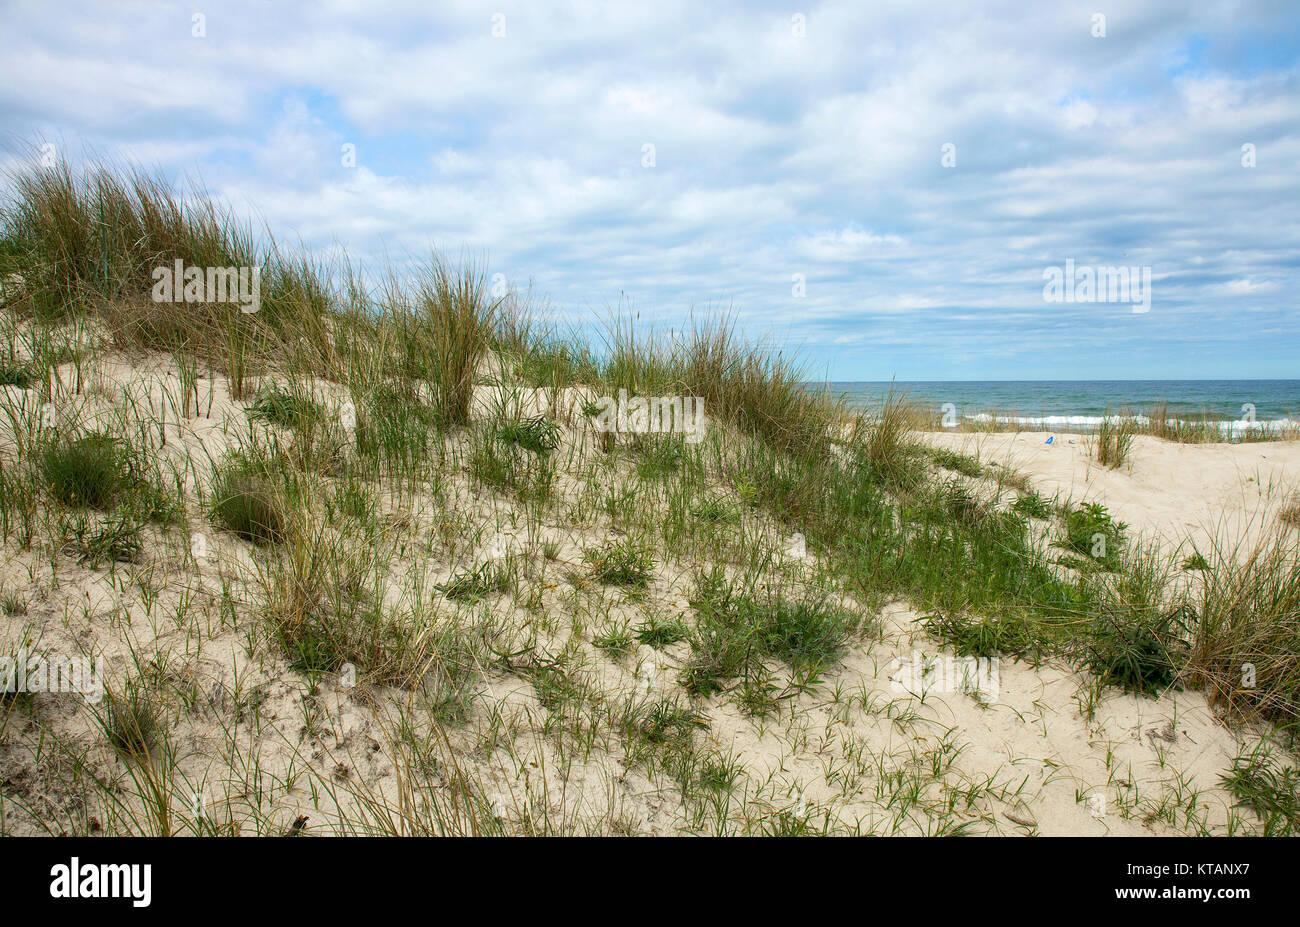 Marram grass and Baltic Sea at Baabe, Moenchgut-Granitz, Ruegen island, Mecklenburg-Western Pomerania, Baltic Sea, - Stock Image